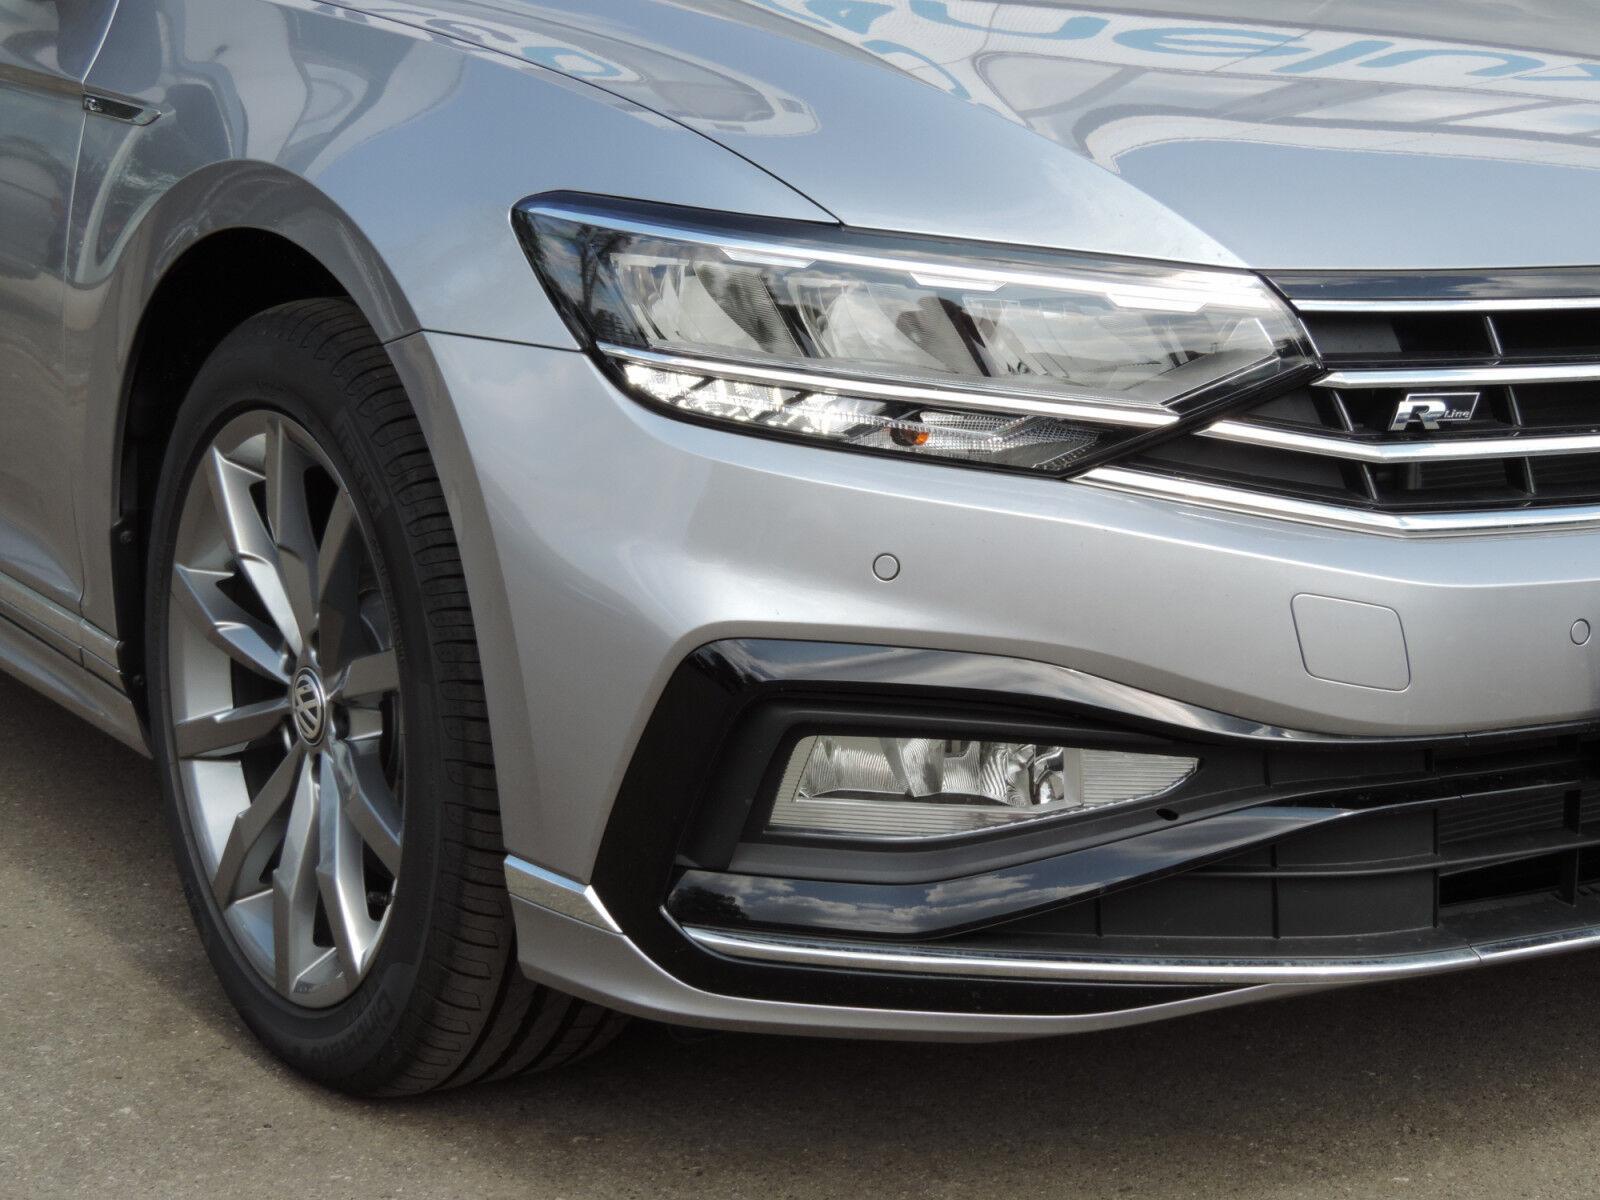 Volkswagen Passat Variant 2.0 TSI R-Line DSG CUIR GPS ACC LANE NEUVE 4/15